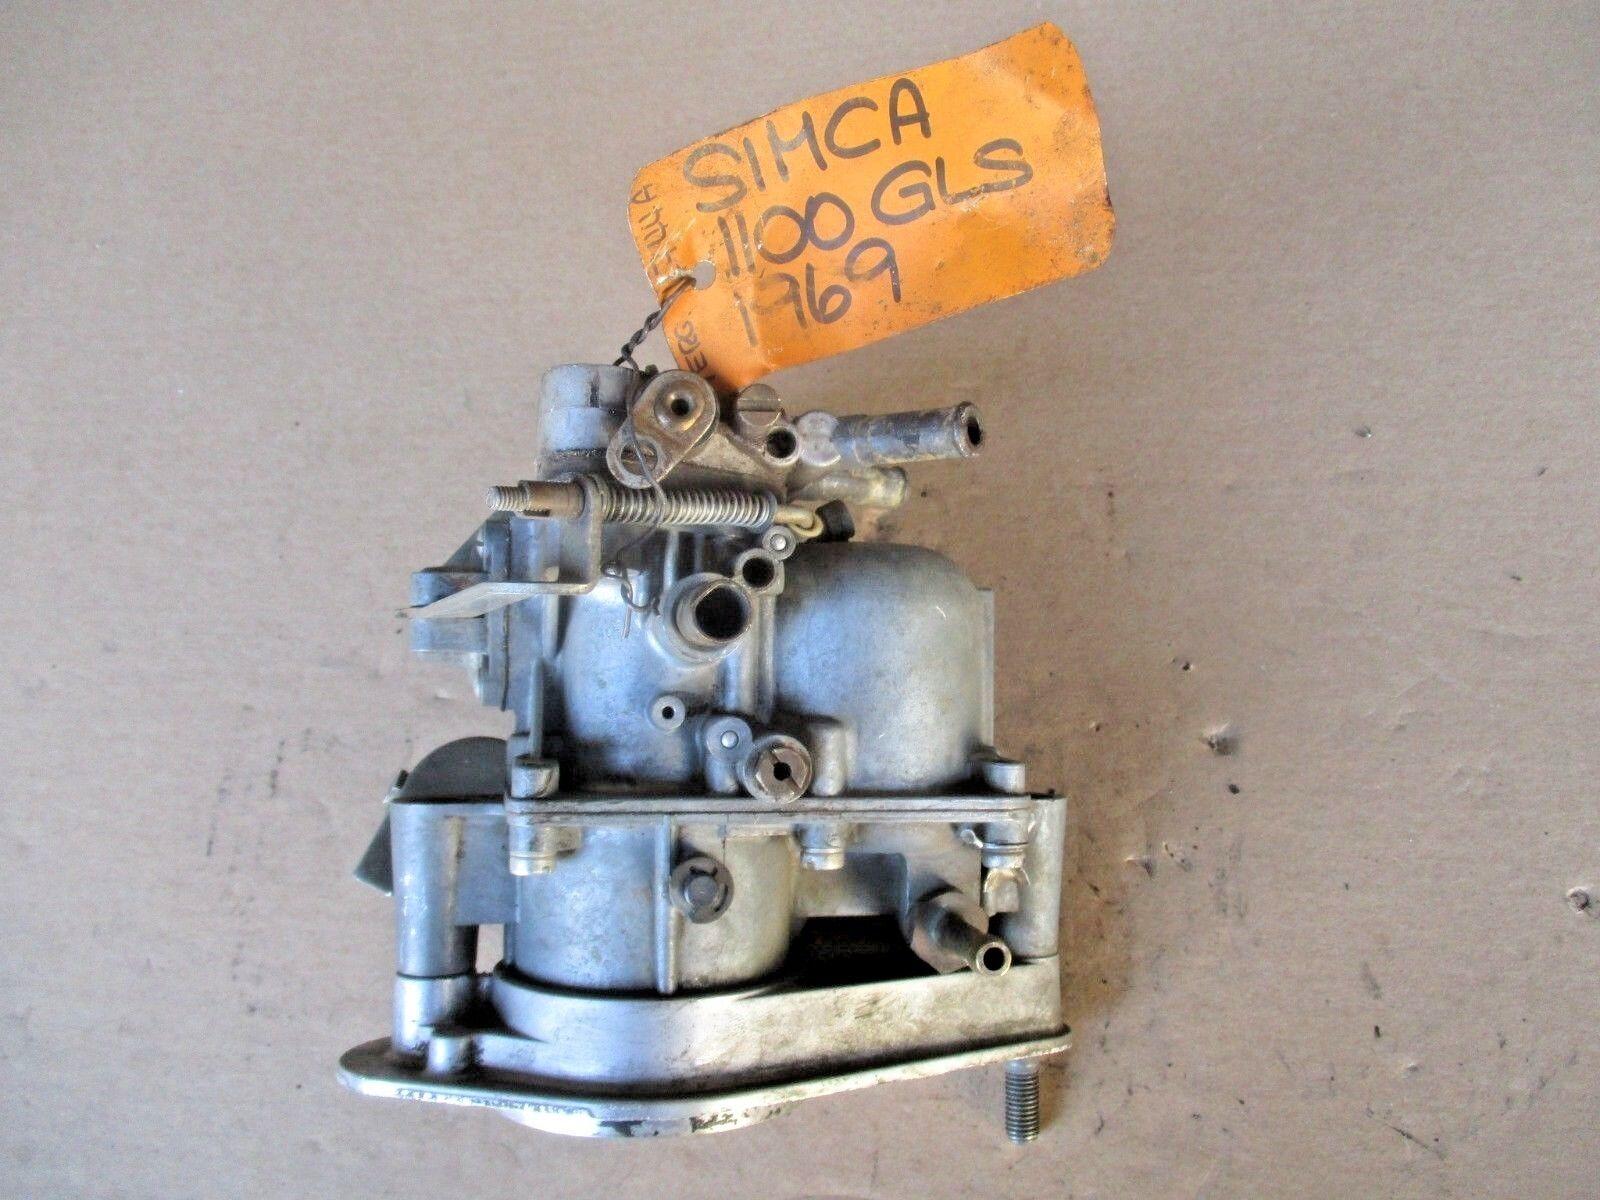 Reparatursatz Solex Fr 32 BISA-9 Vergaser Peugoet 309 GL GR Dichtsatz